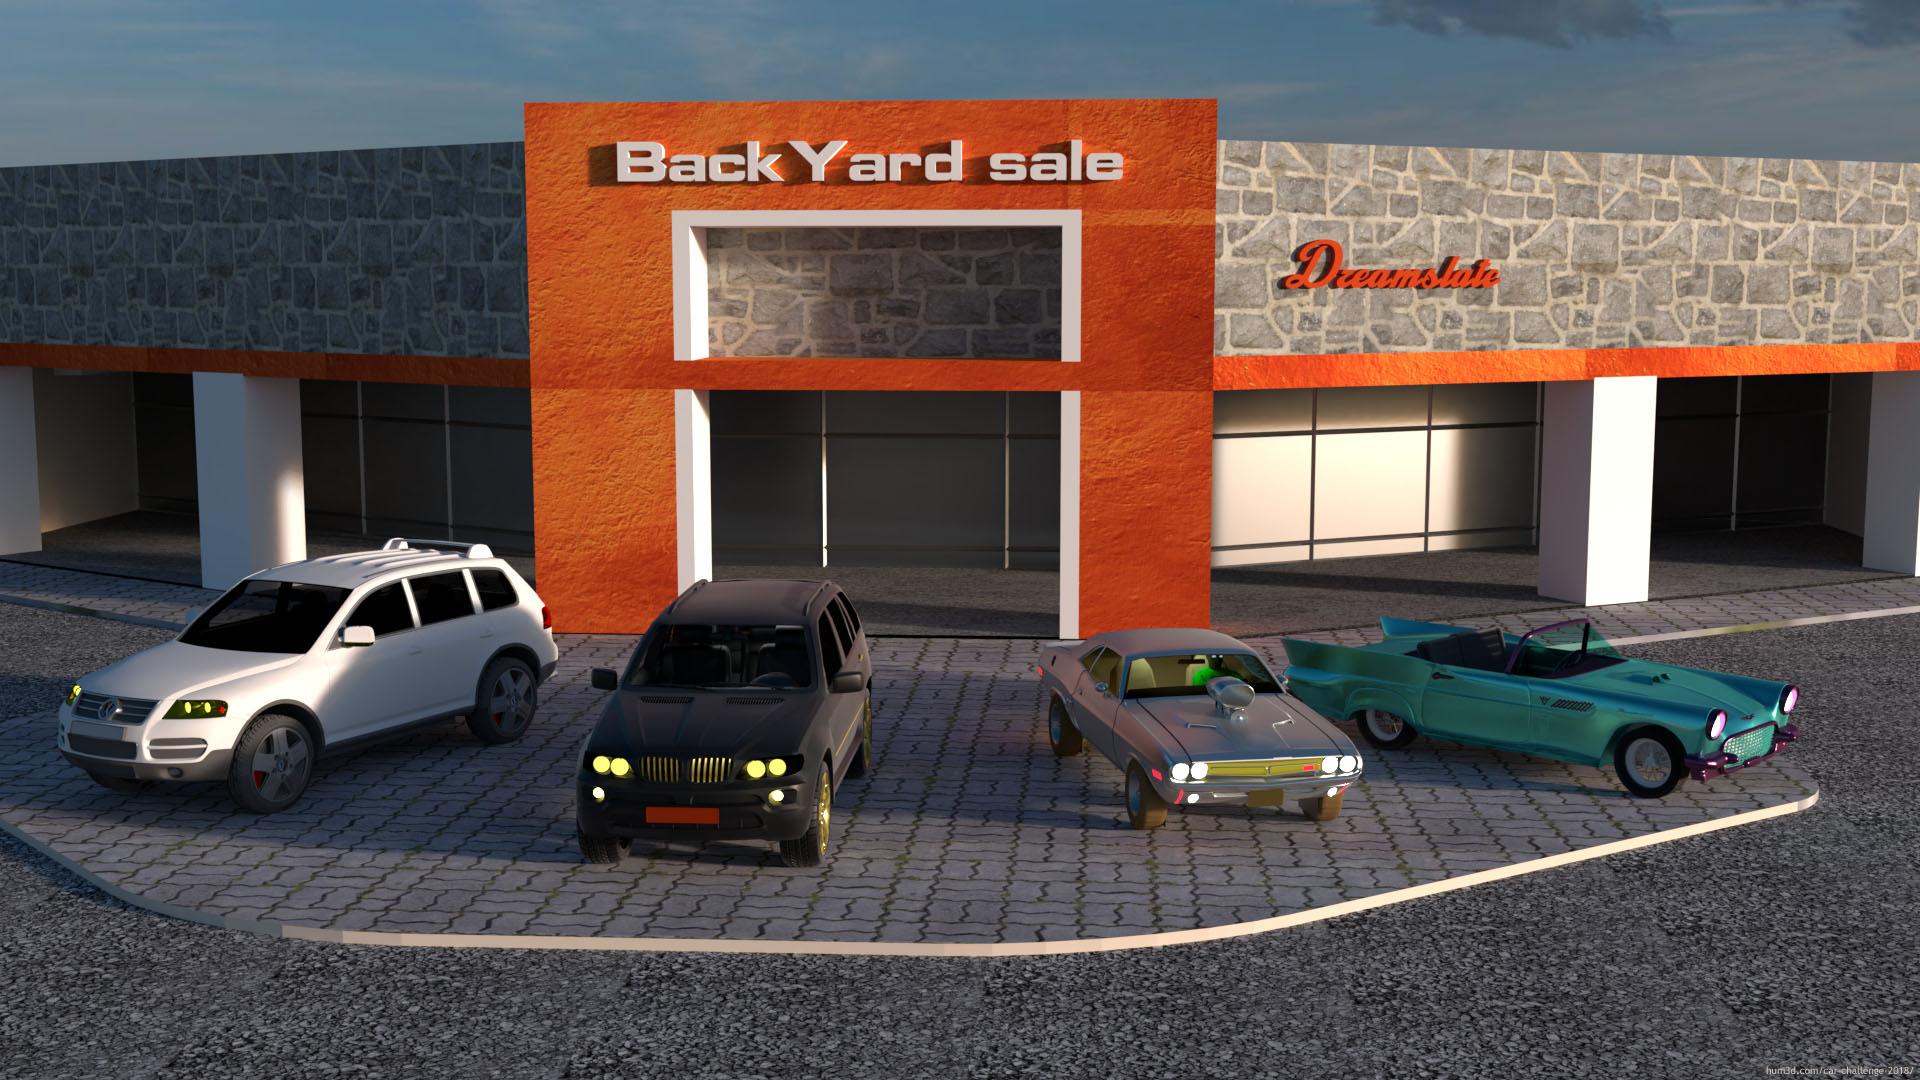 Rich man's yard sale 3d art